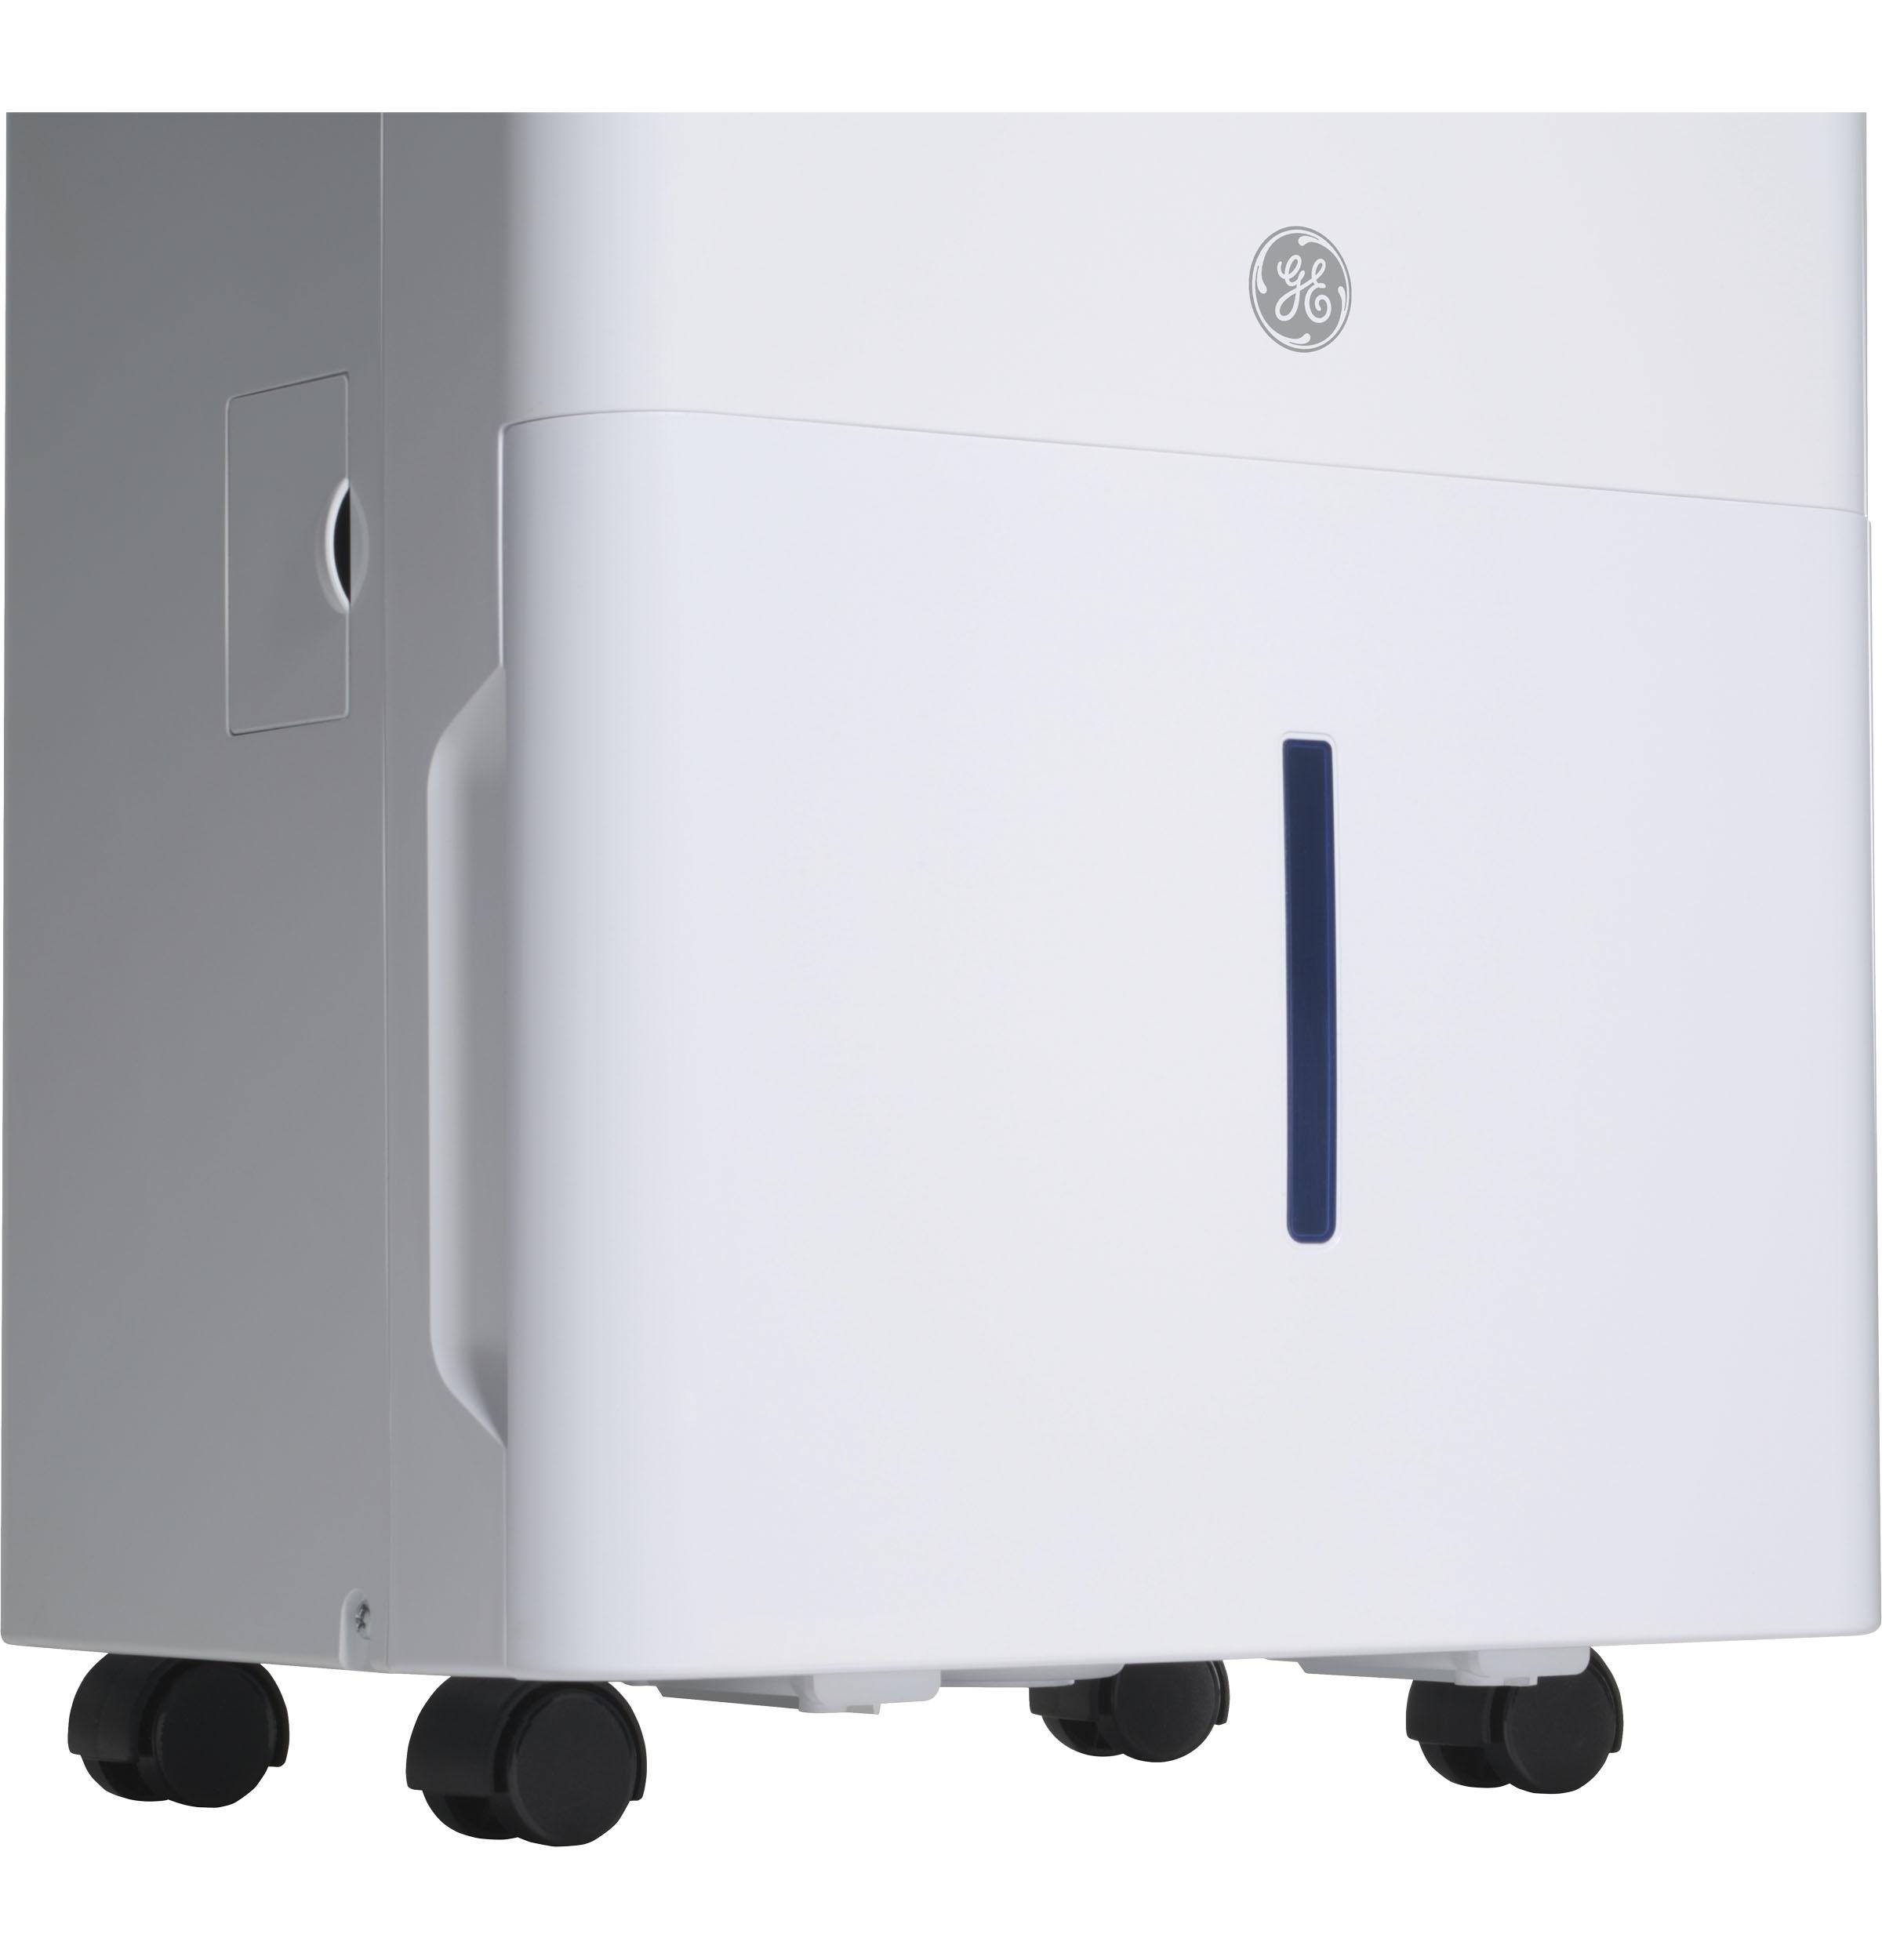 Model: QDHR50LZ | Haier Haier® ENERGY STAR® 50 Pint Dehumidifier for Home or Basement, Large, White